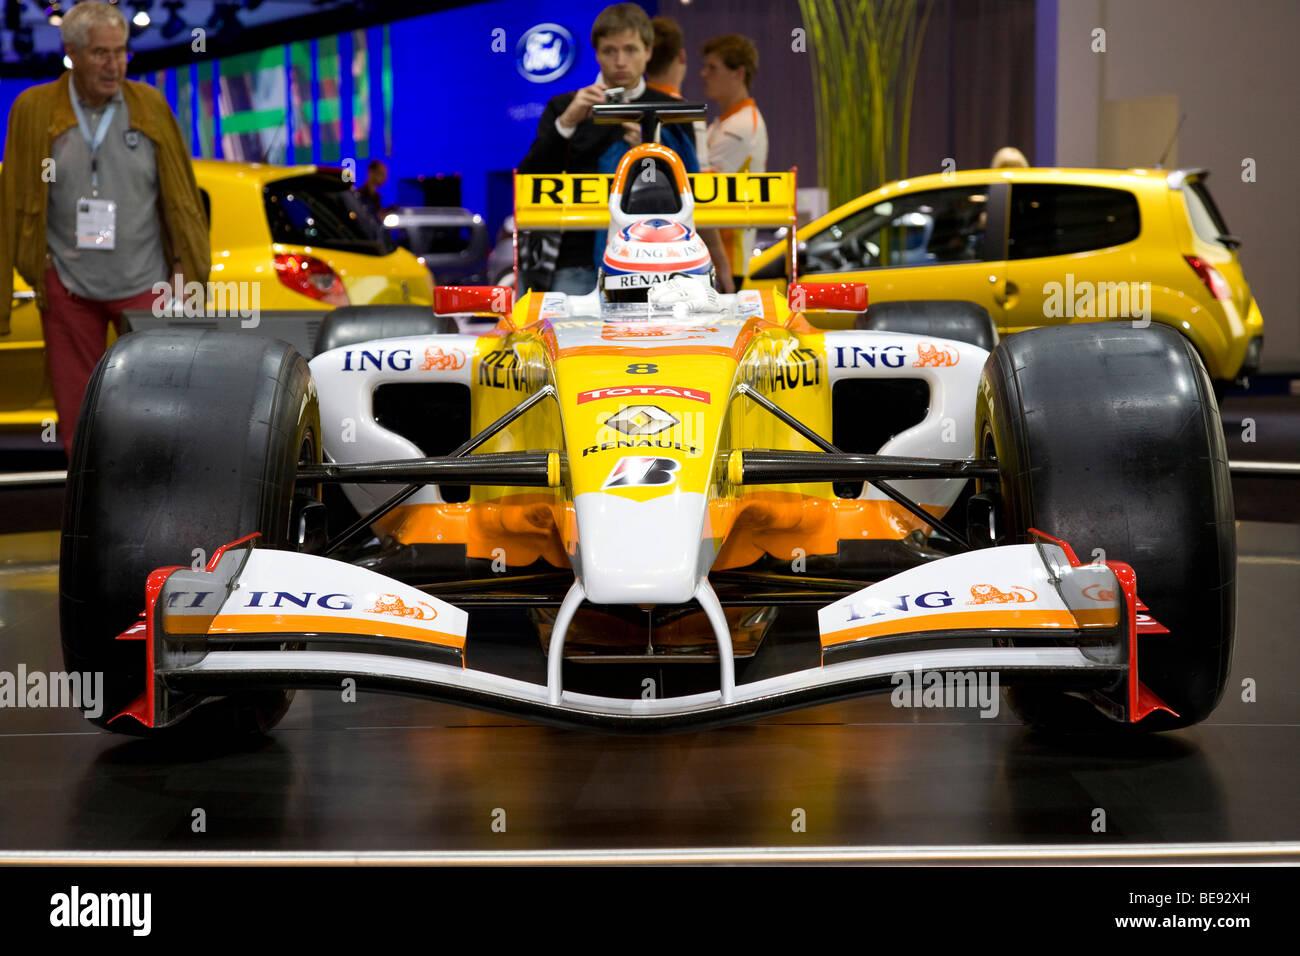 Renault formula one F1 racing car at a European motor show - Stock Image